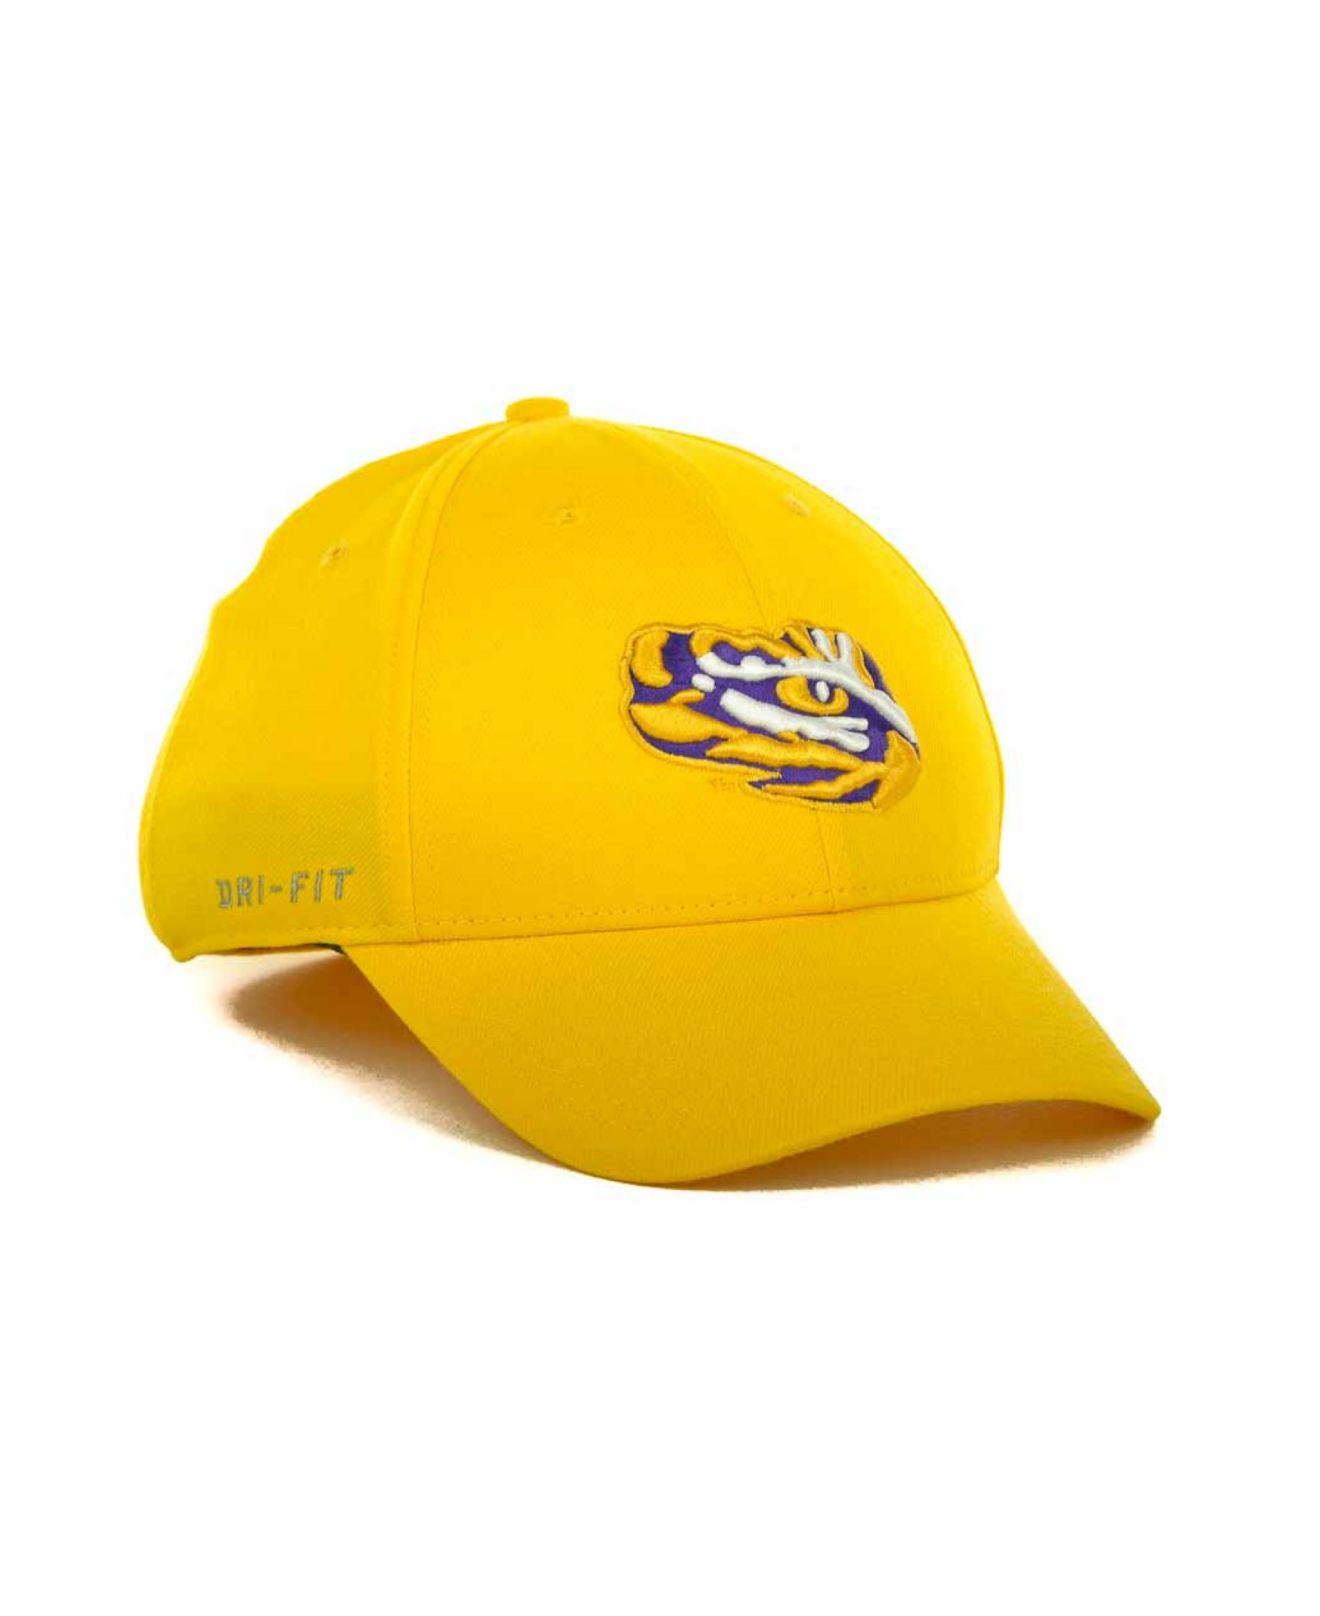 5c083dd4aaa8c Lyst - Nike Lsu Tigers Drifit Swoosh Flex Cap in Metallic for Men